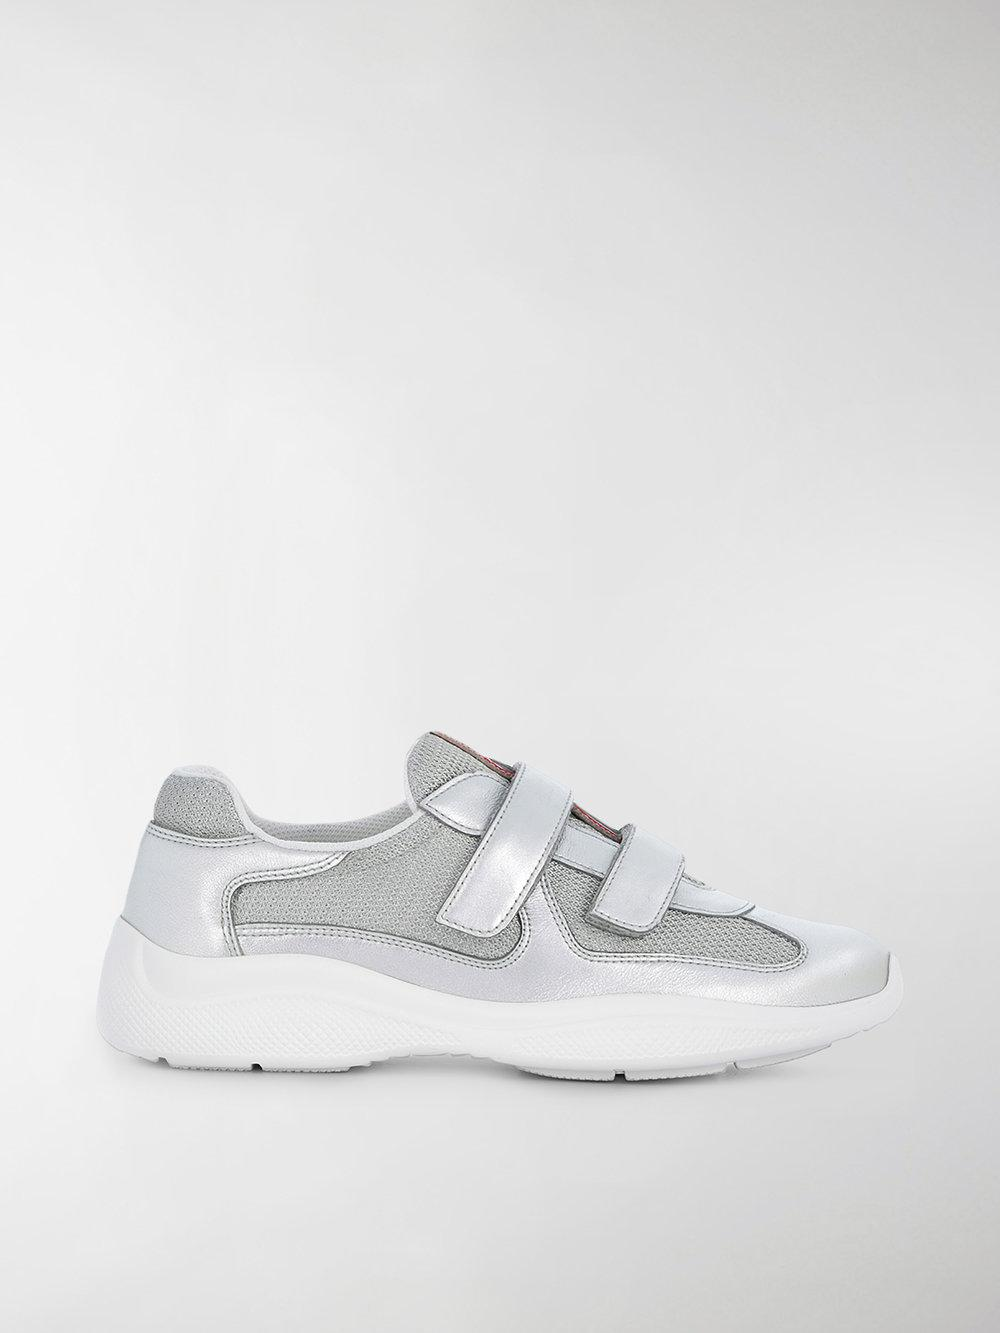 touch-strap sneakers - Metallic Prada o8zaC55AY